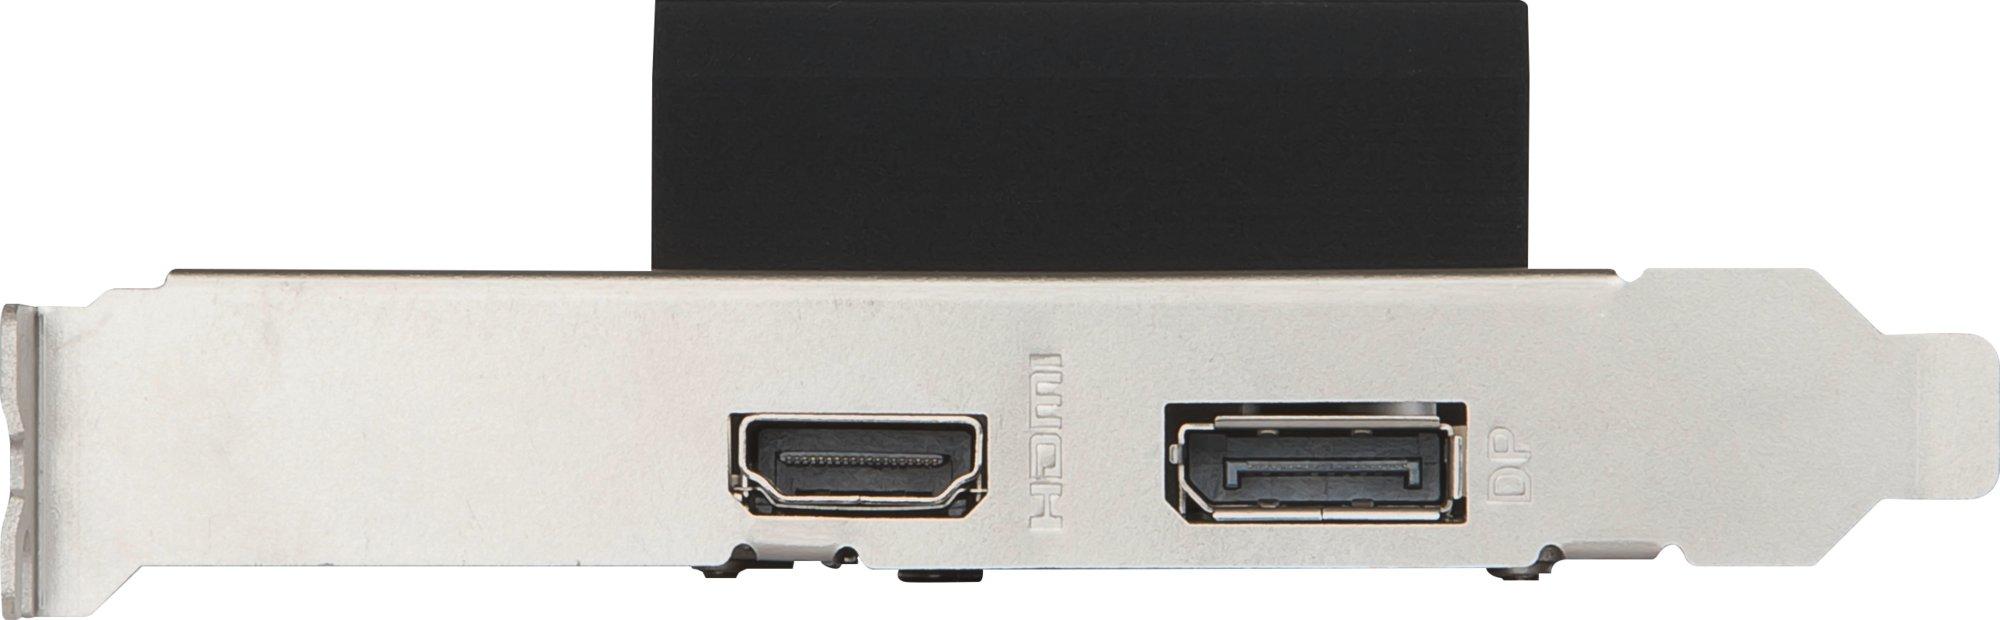 MSI VGA nVidia GT 1030 2GB LP OC